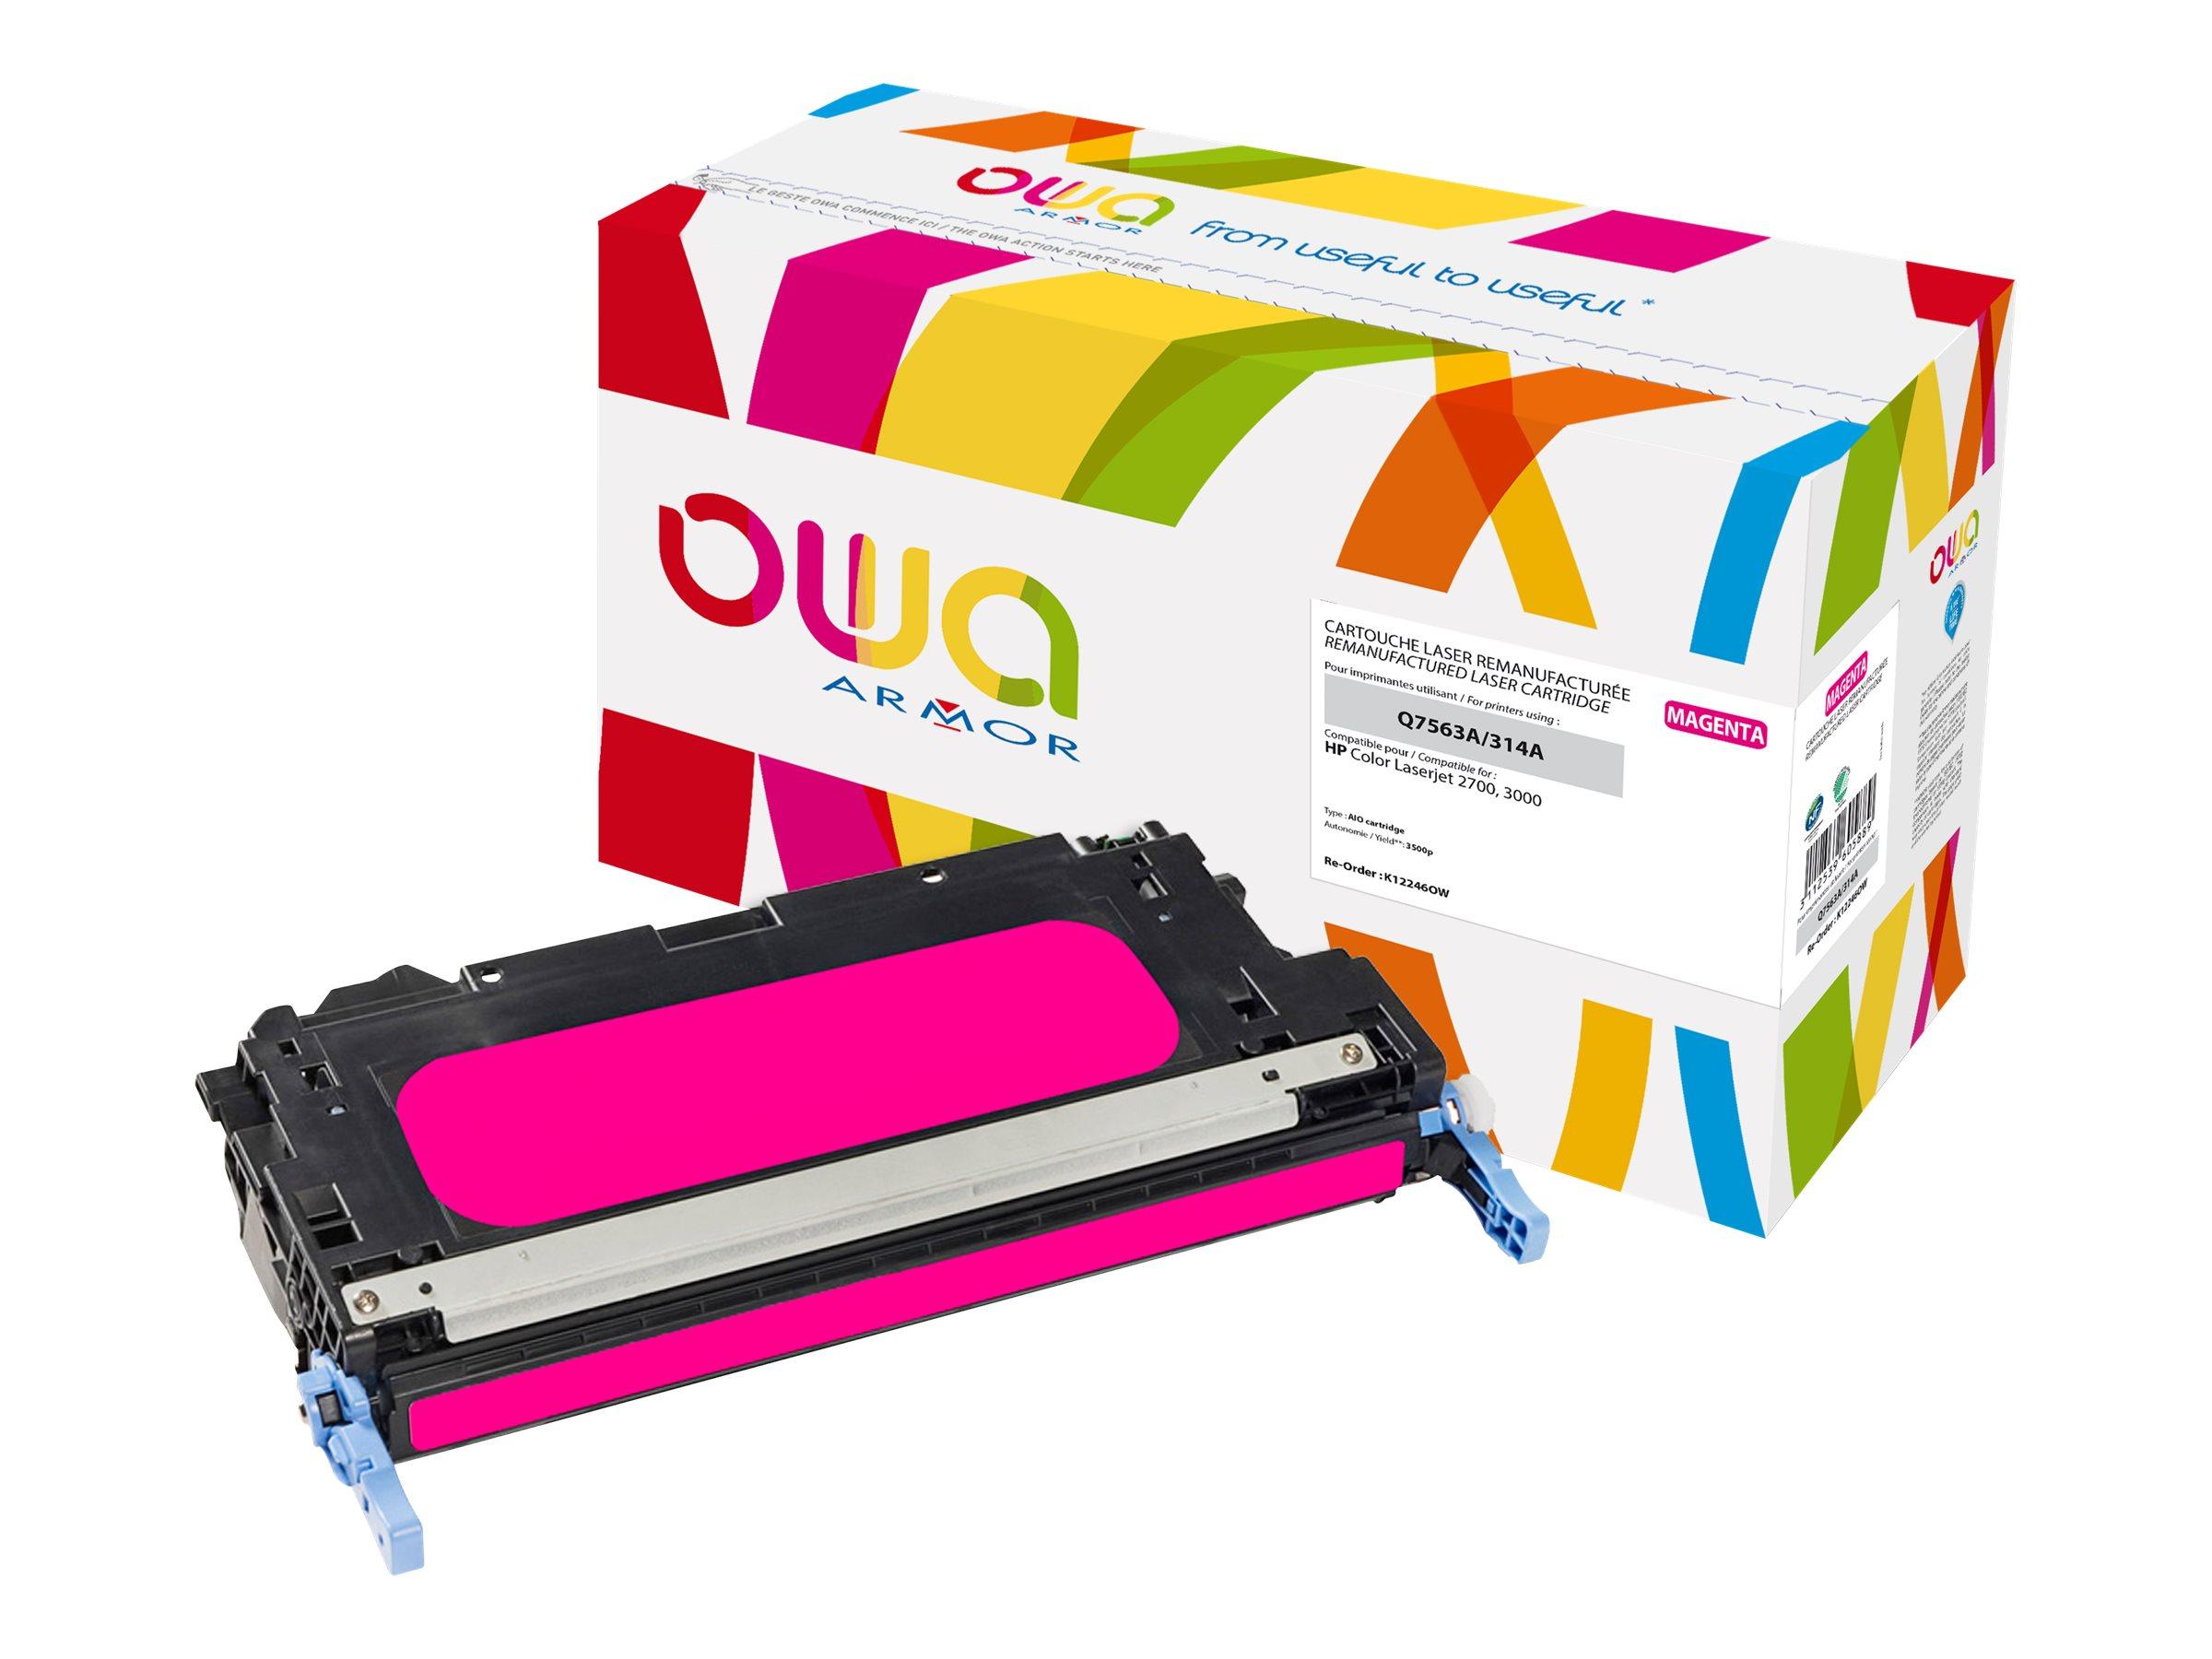 HP 314A - remanufacturé Owa K12246OW - magenta - cartouche laser